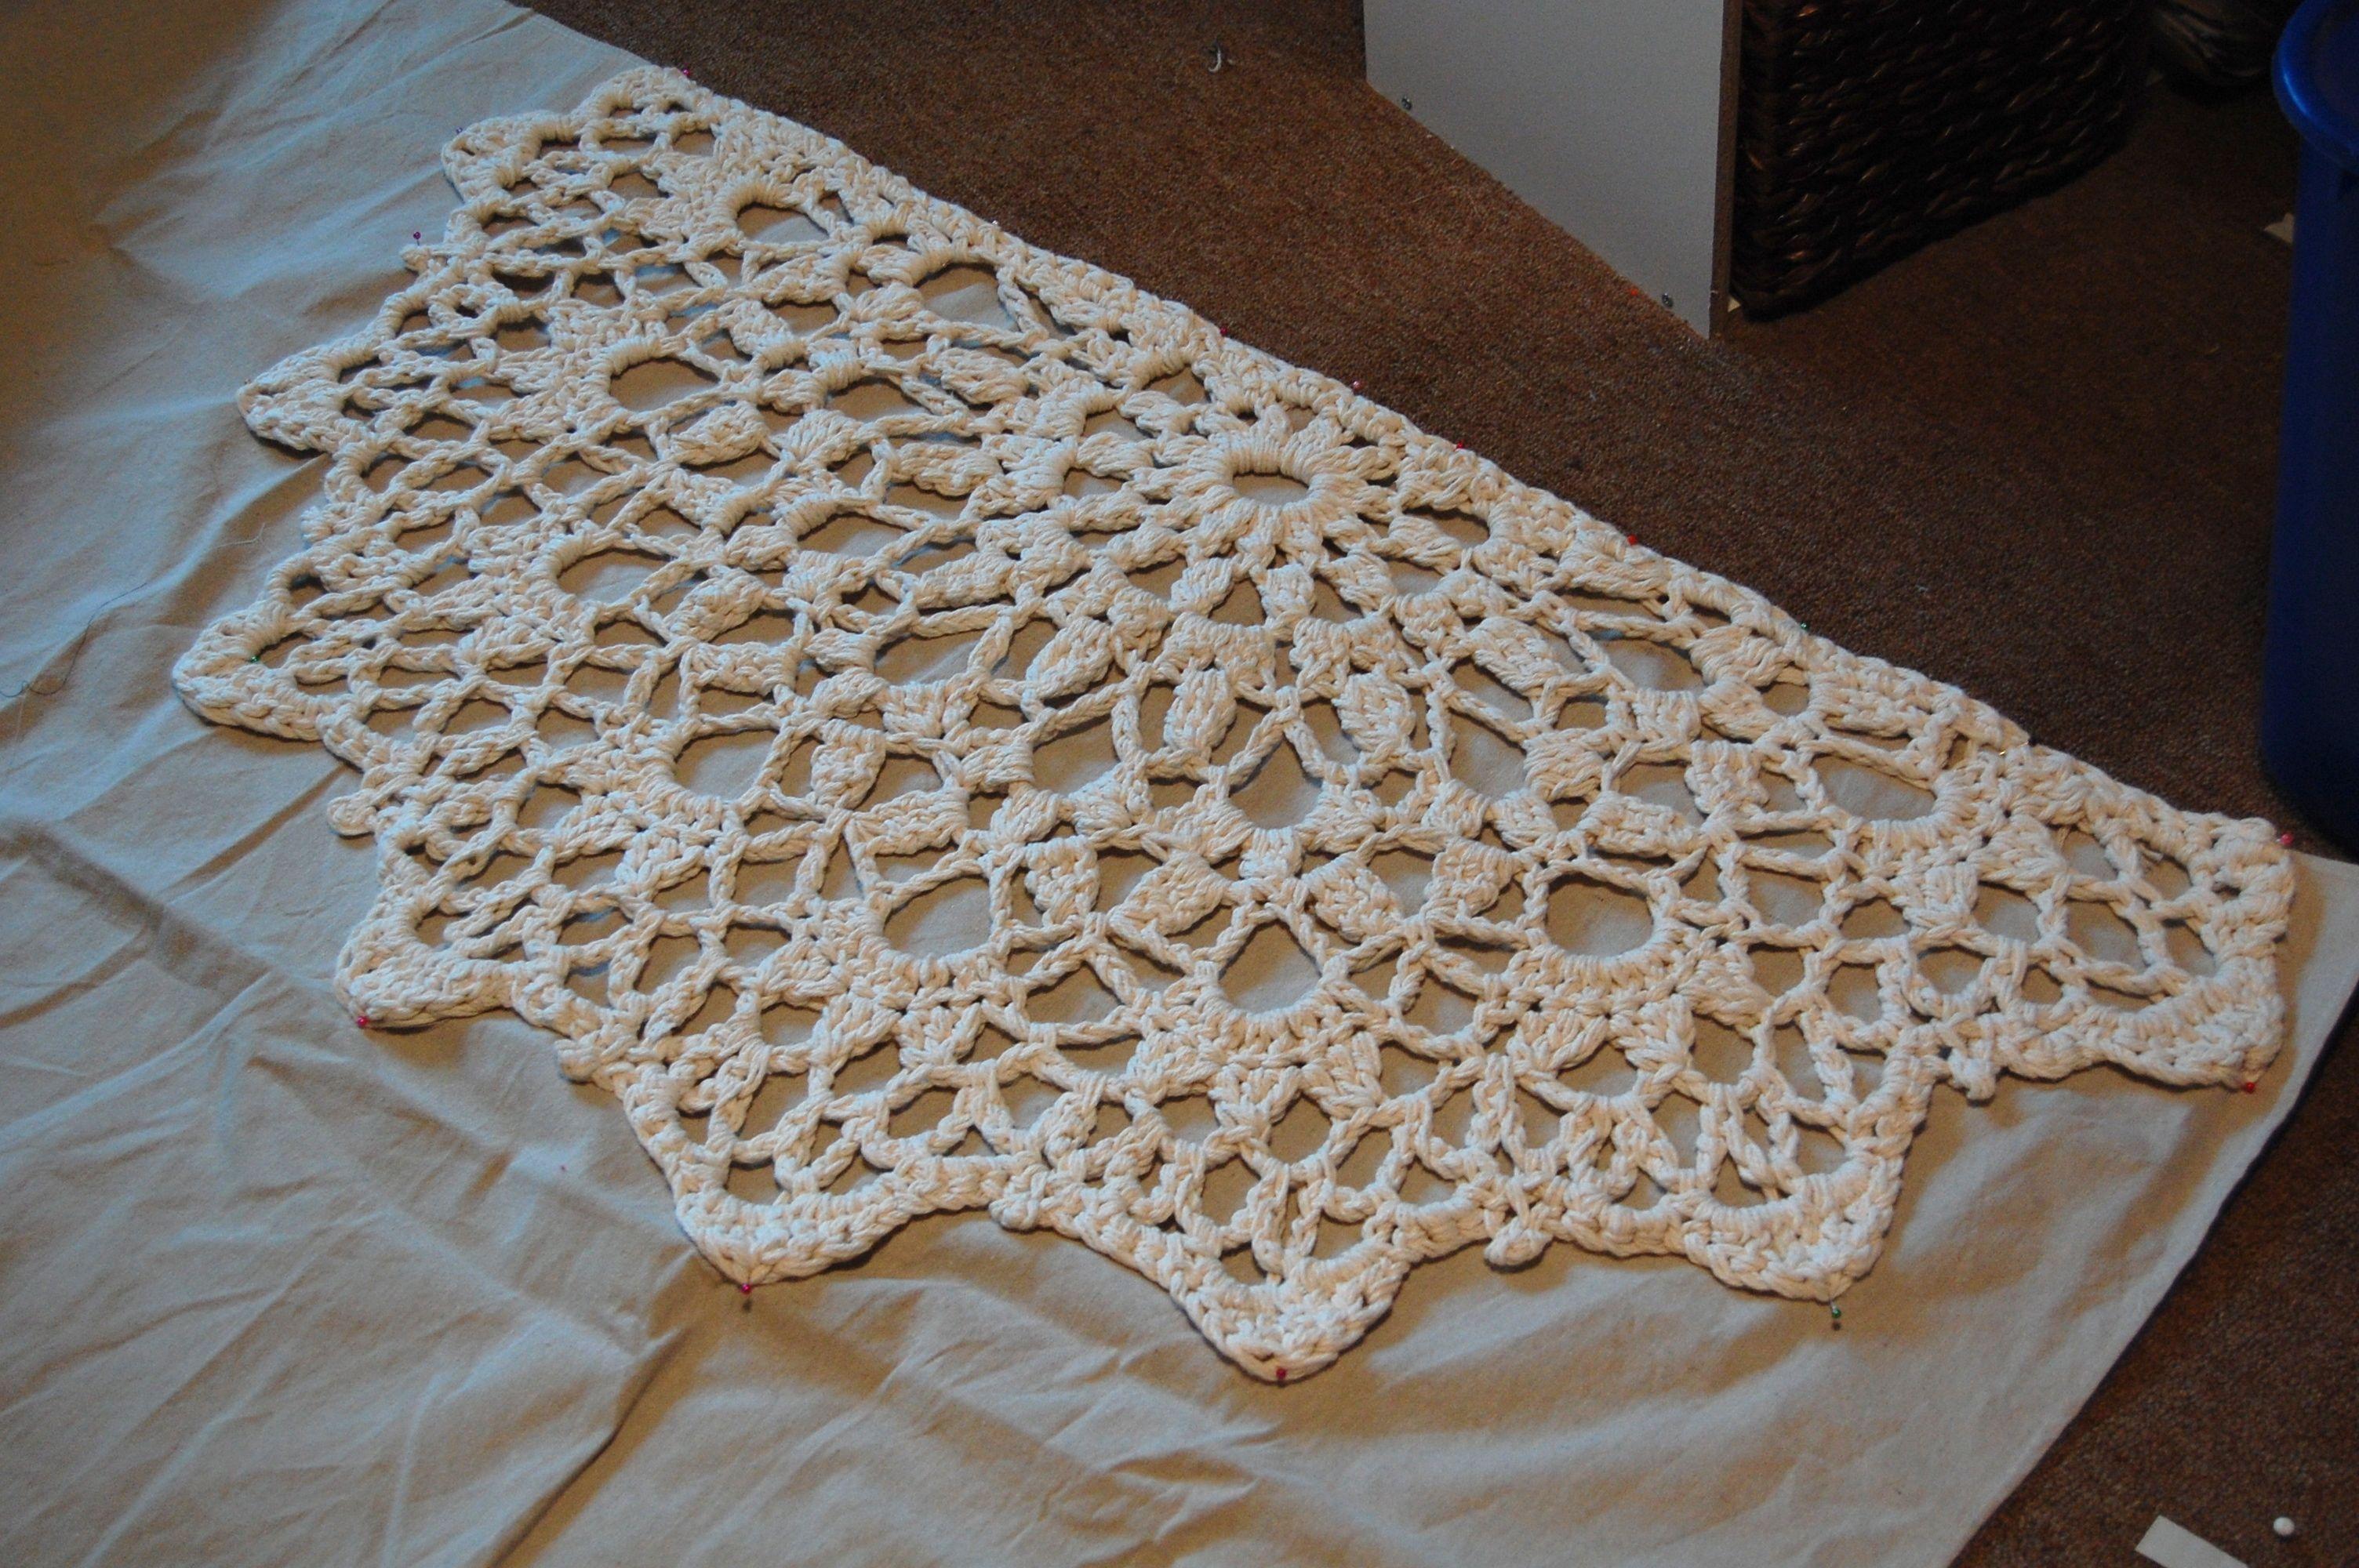 Half Circle Crochet Rug Pattern Google Search Crochet Rug Patterns Free Crochet Rug Crochet Rug Patterns